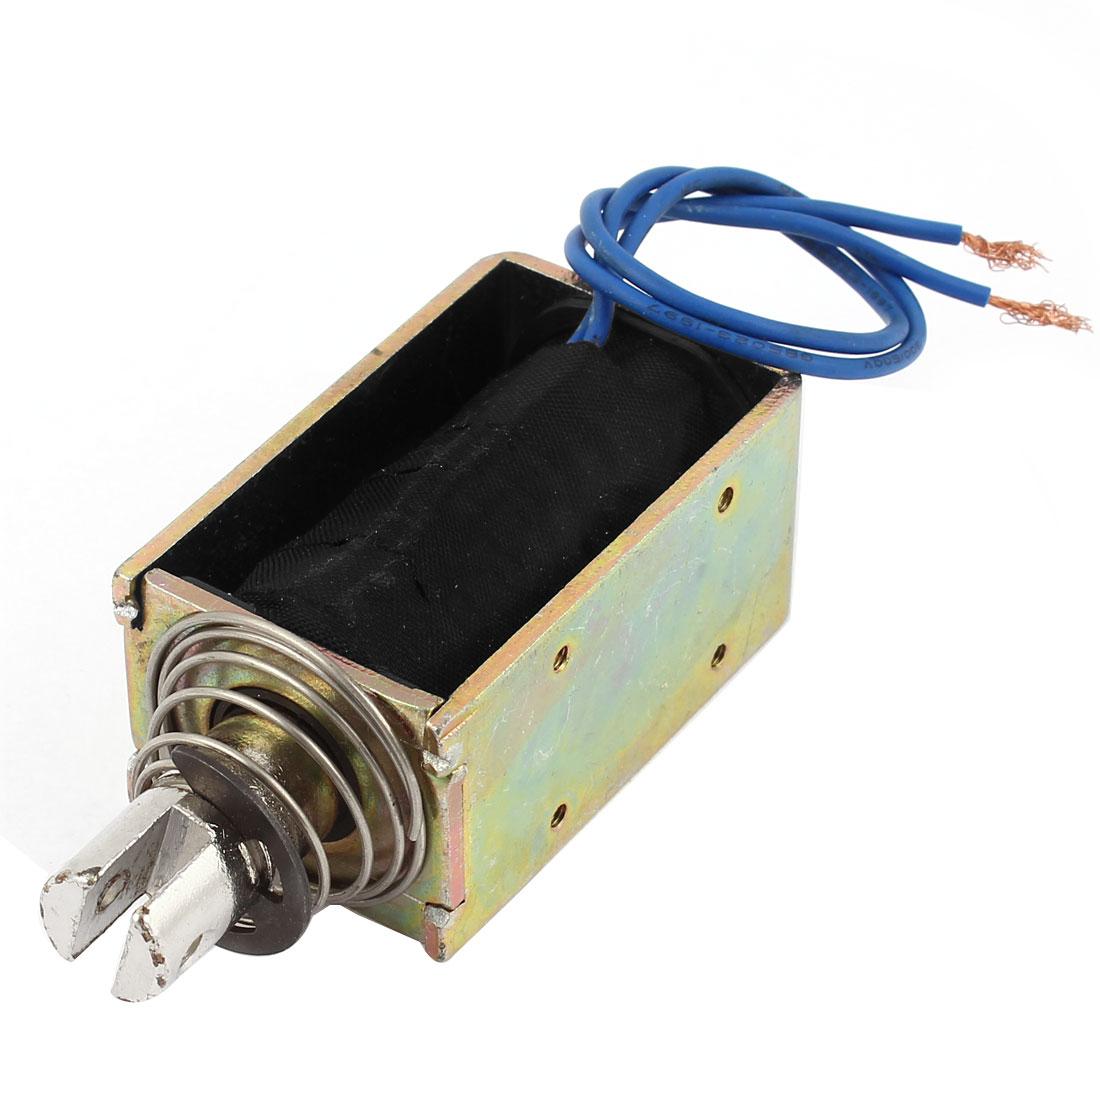 DC 12V 10mm 55N Open Frame Pull Type Solenoid Electromagnet Actuator